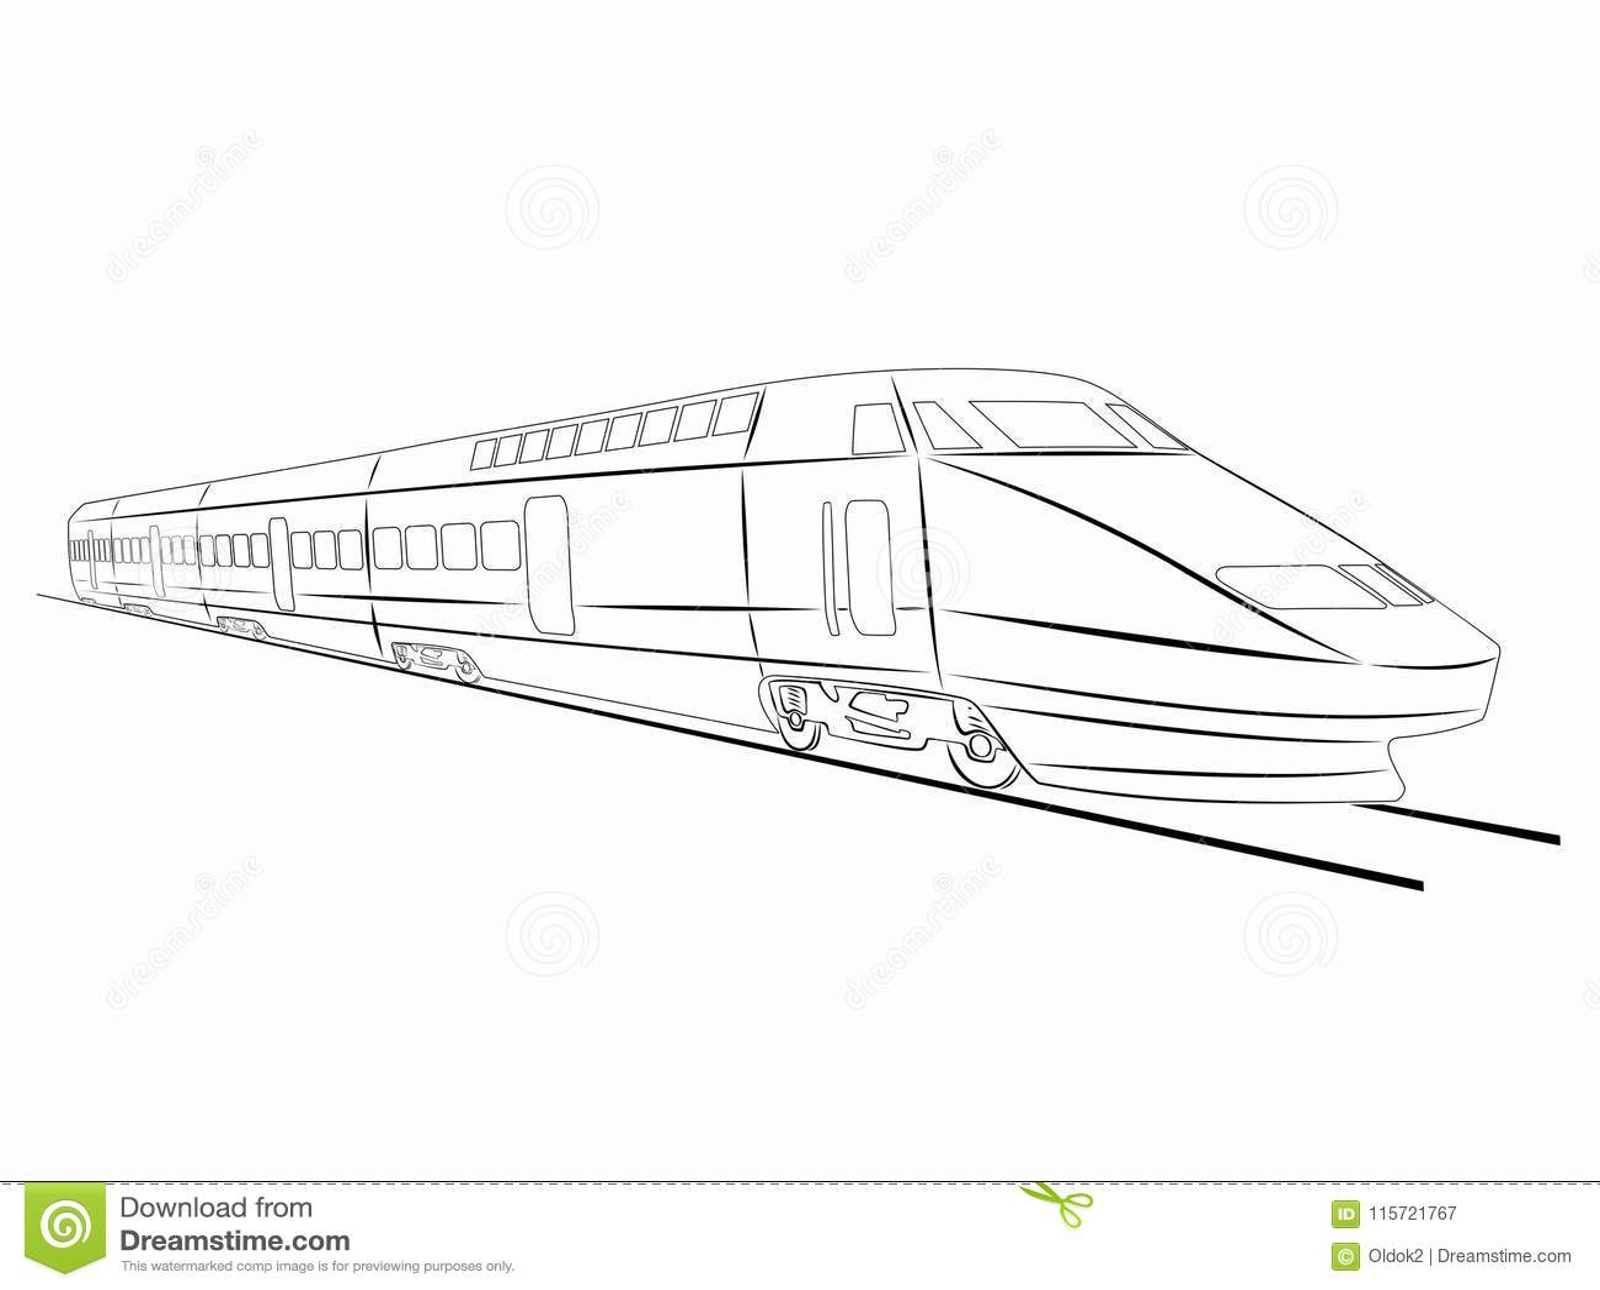 Illustration Train Vector Drawing Stock Vector Illustration of